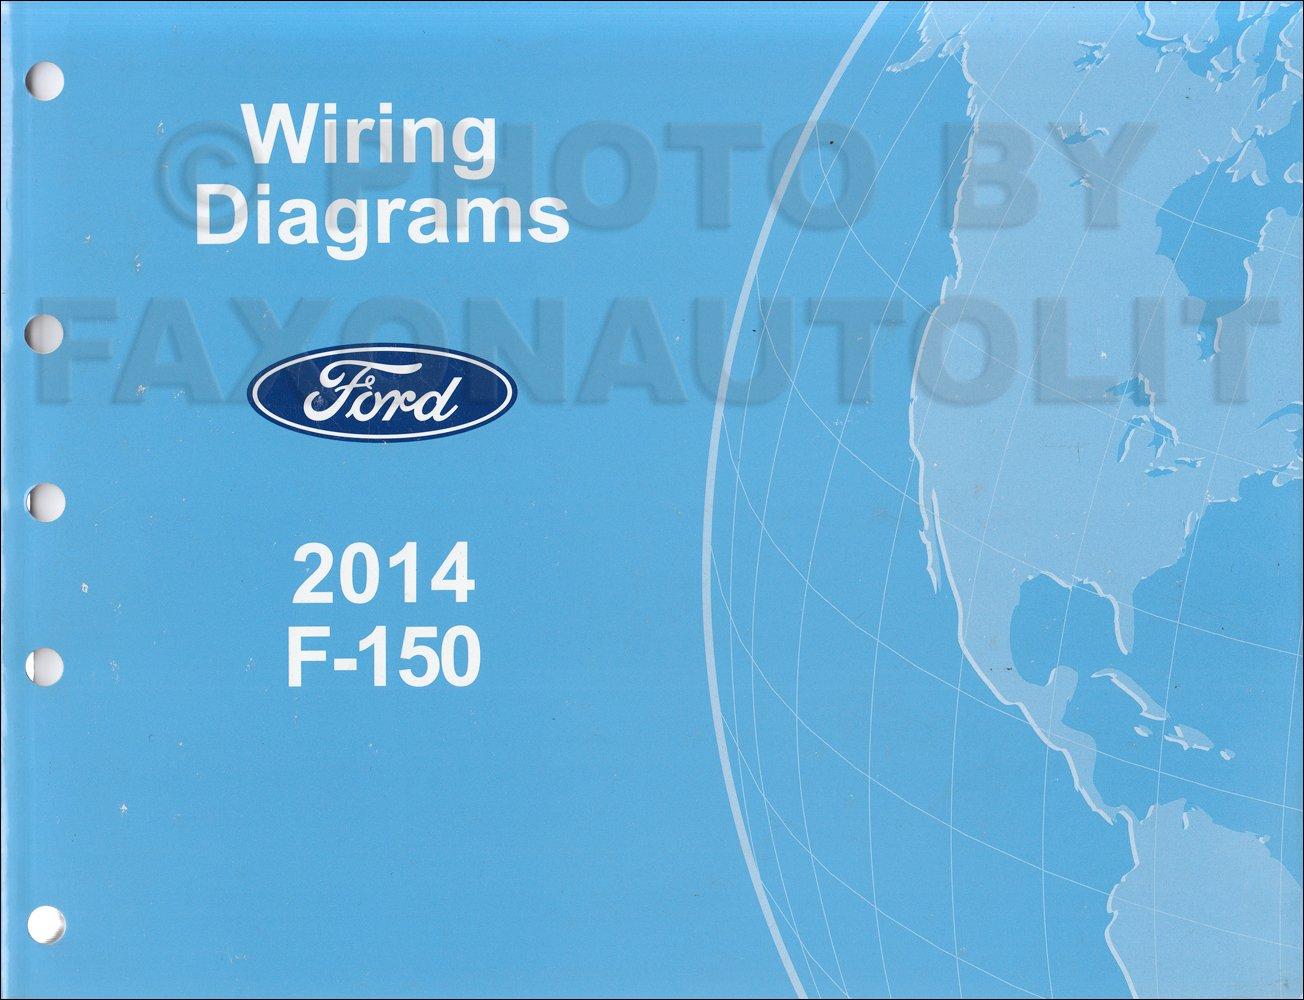 2014 Ford F-150 Wiring Diagram Manual Original: Ford: Amazon.com: Books